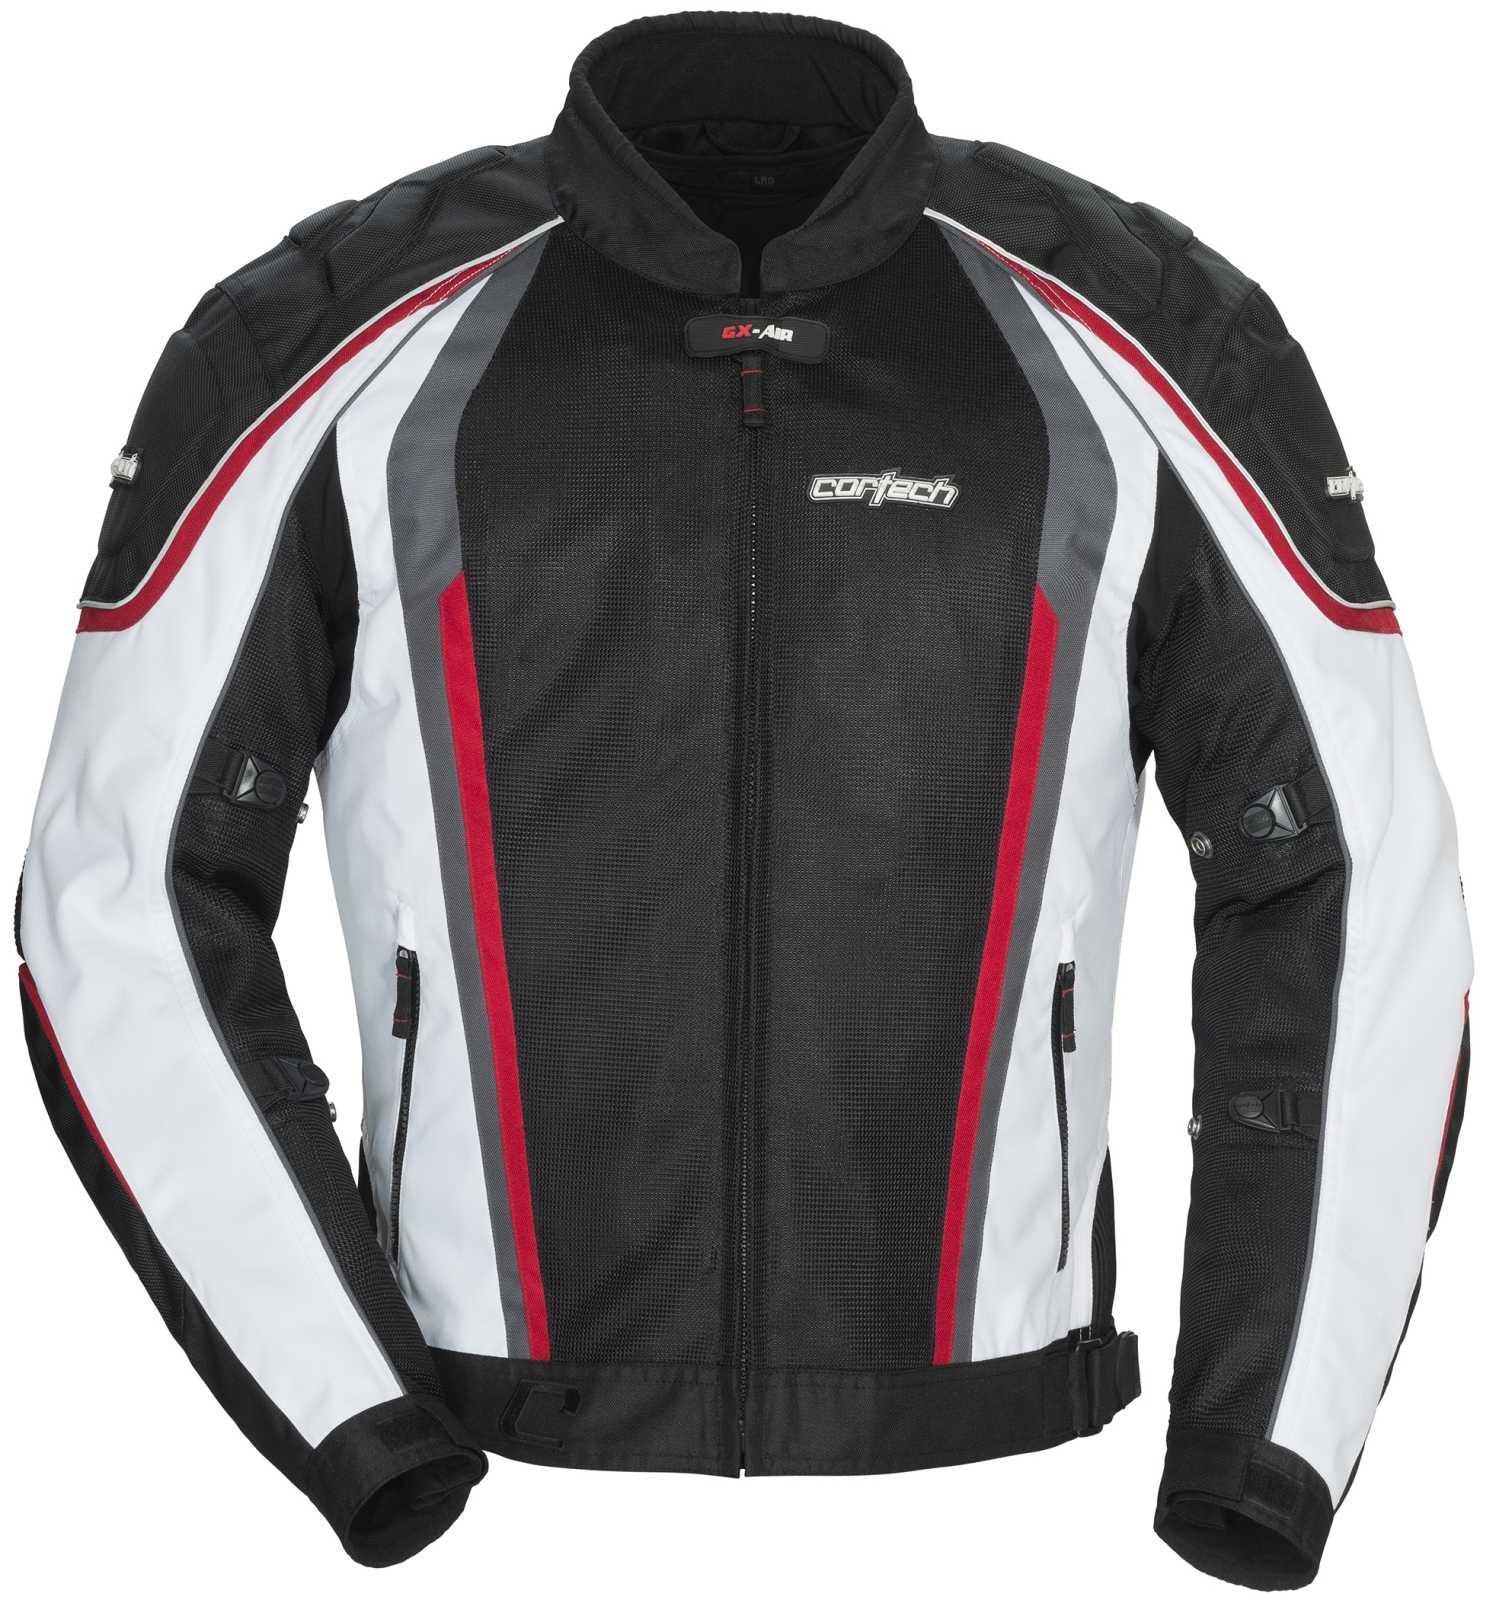 Cortech GX Sport Air 4.0 Adult Mesh Road Race Motorcycle Jacket - White/Black / Medium